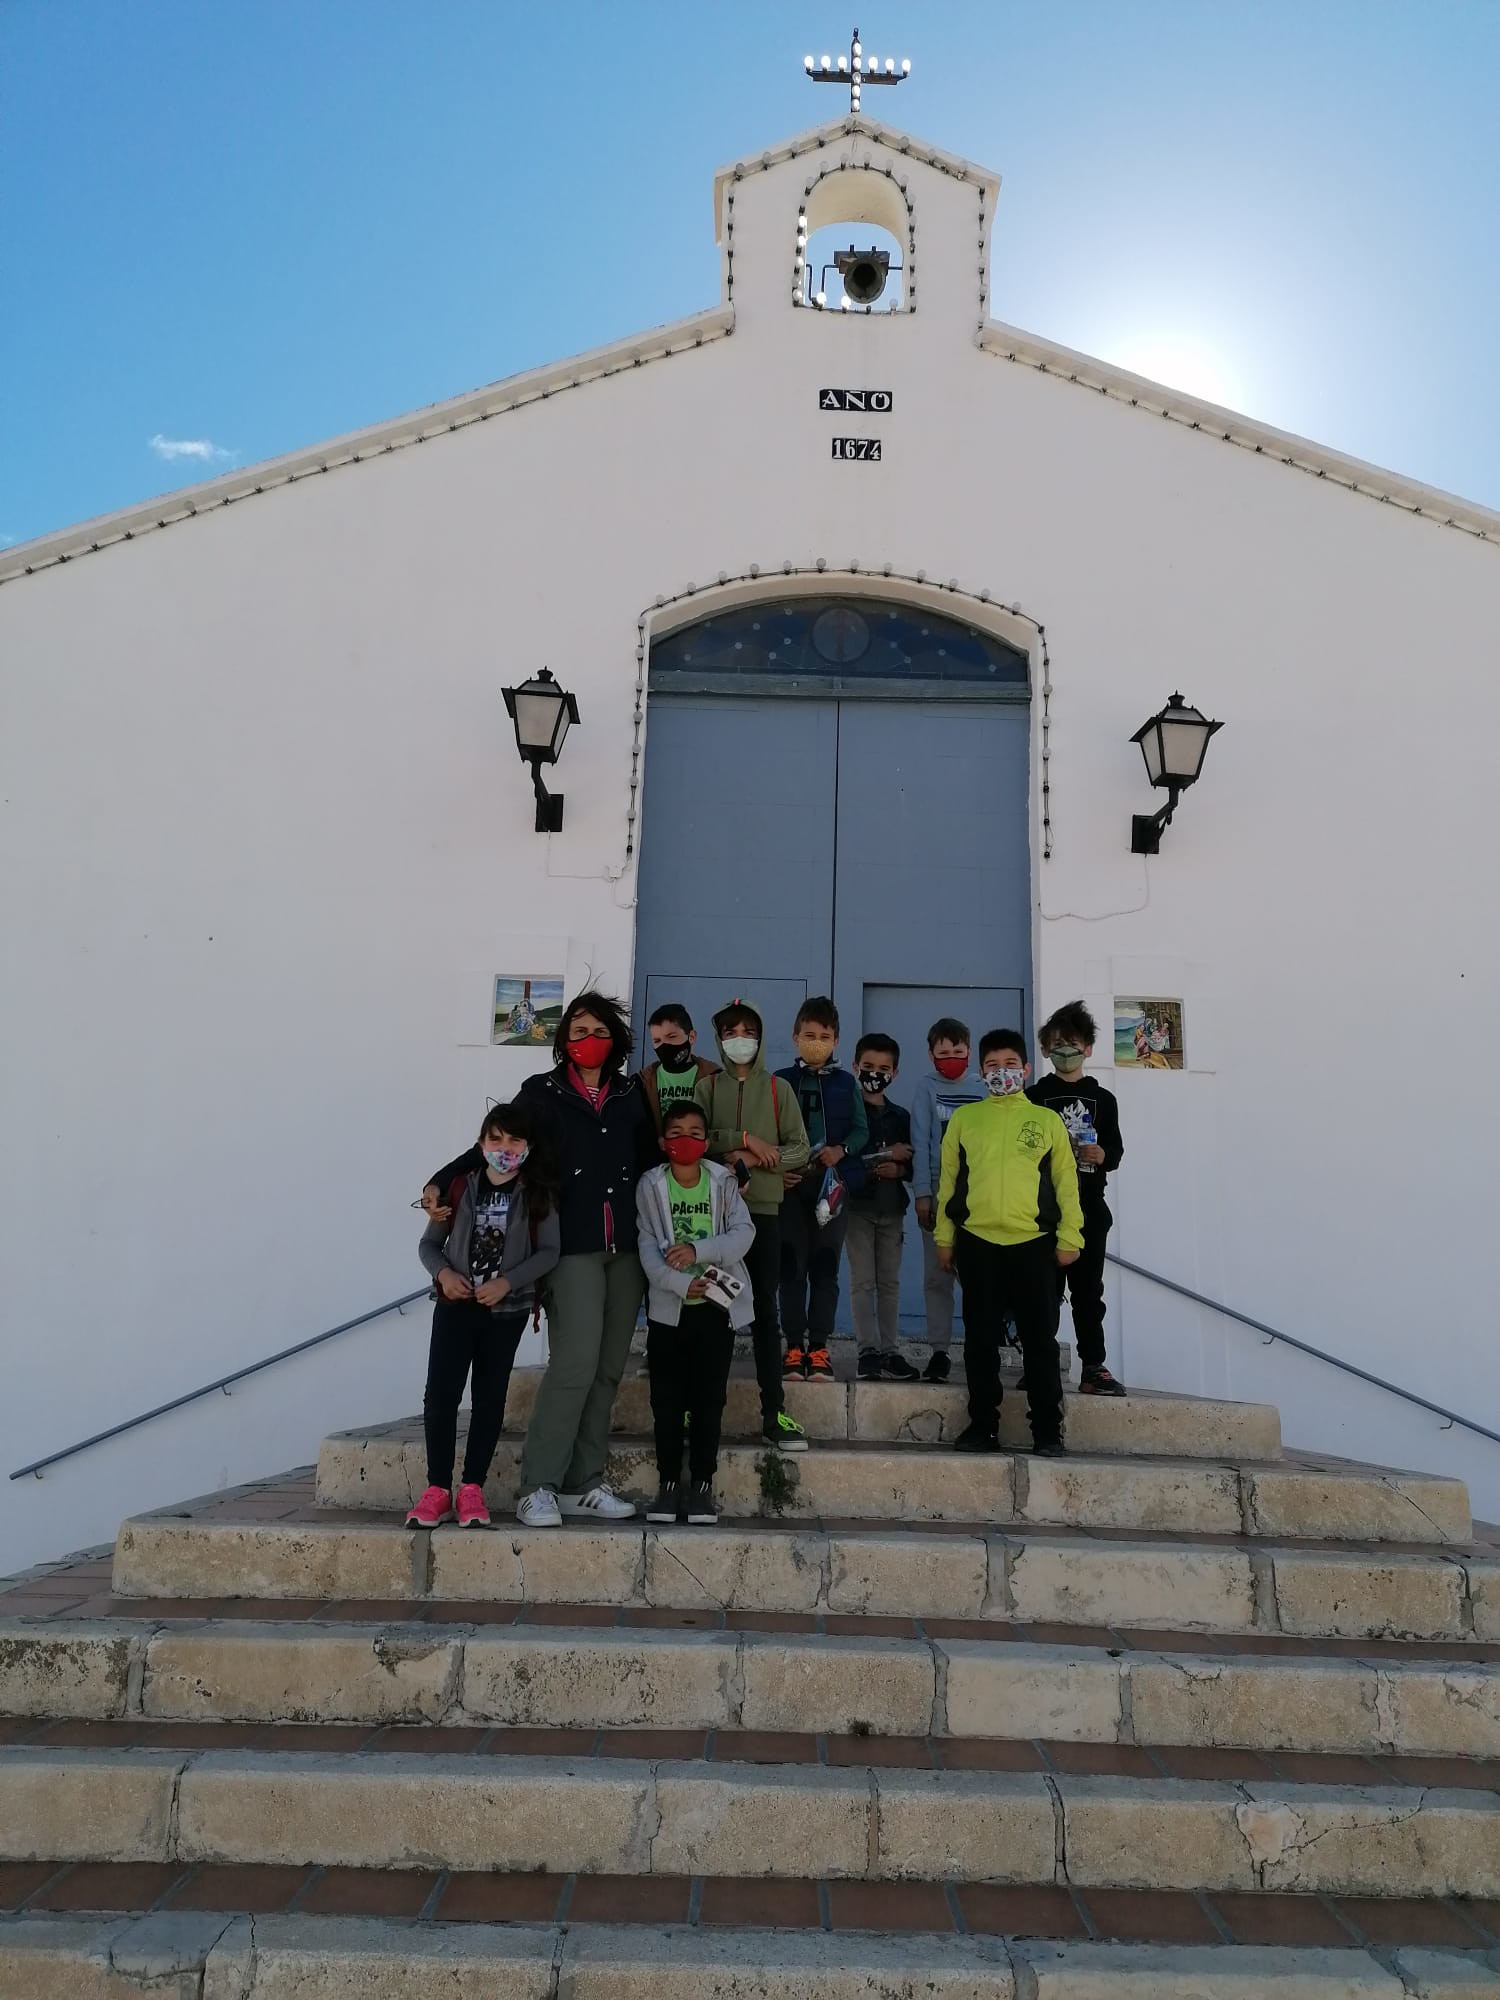 (2021-05-11) - Visita ermita alumnos Laura,3º B, Reina Sofia - Maria Isabel Berenquer Brotons - (01)